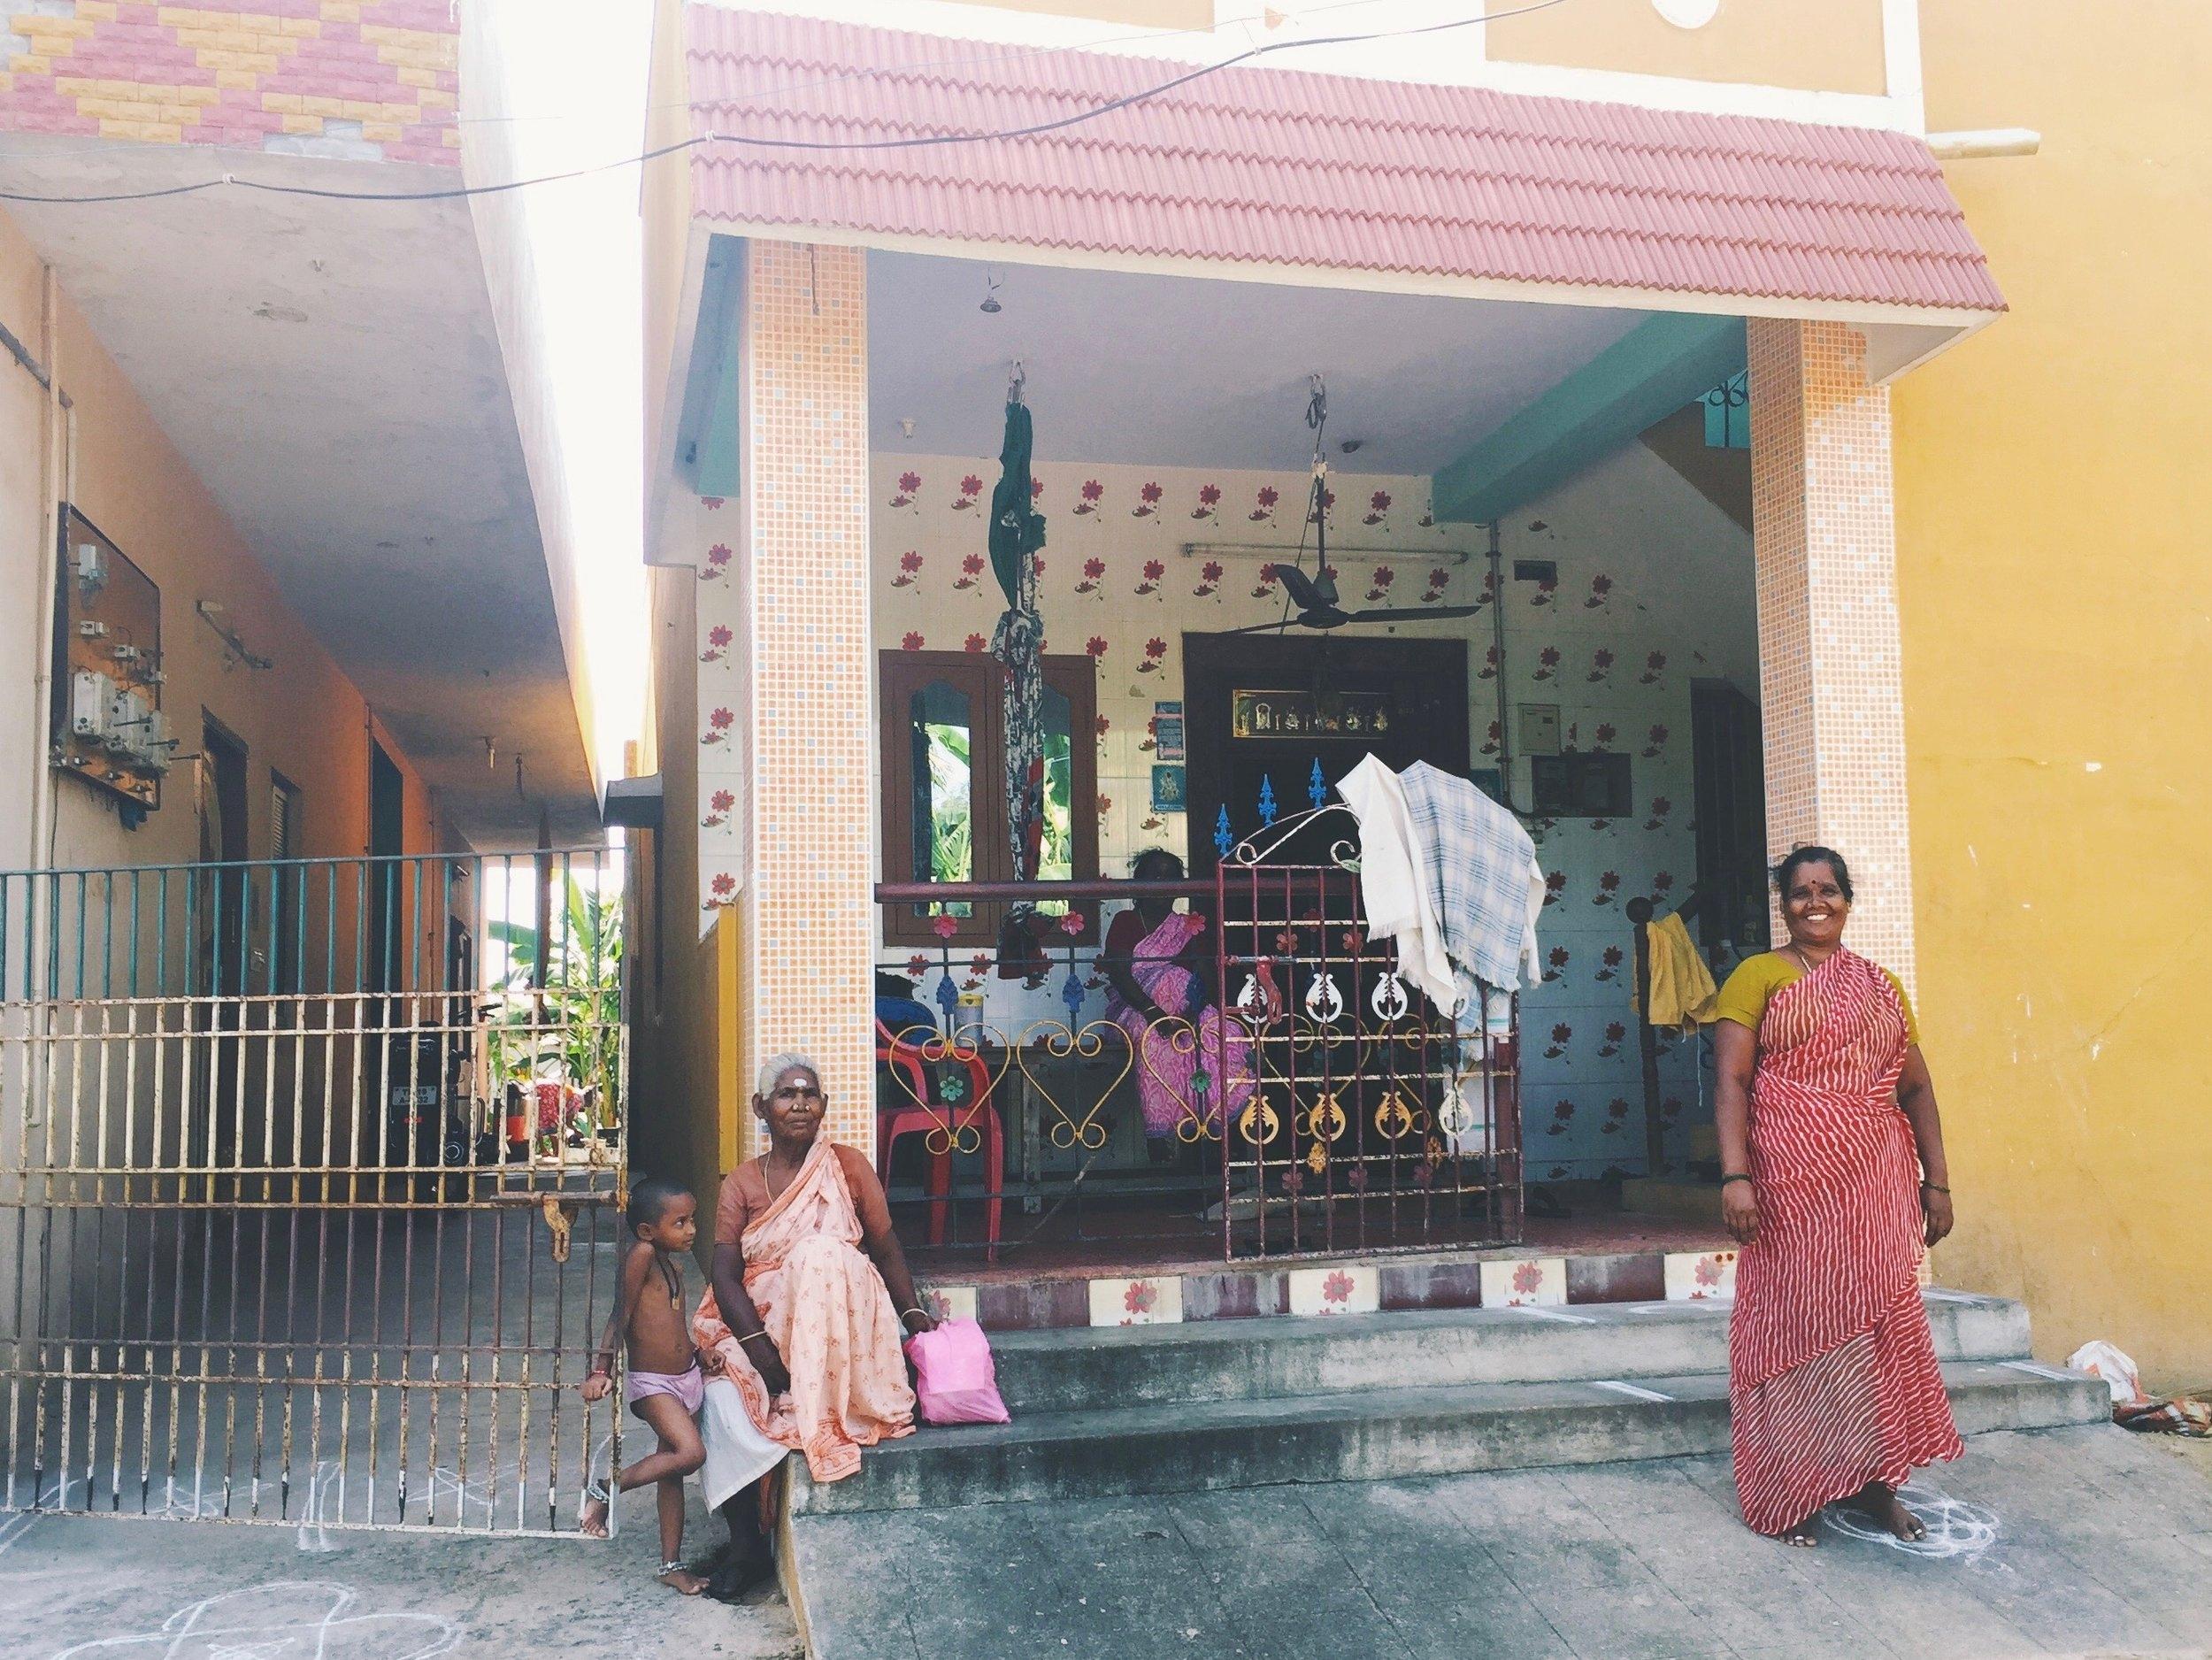 Three generations of women in Hanumanthapuram village.Photo by, Mary Elizabeth Heard